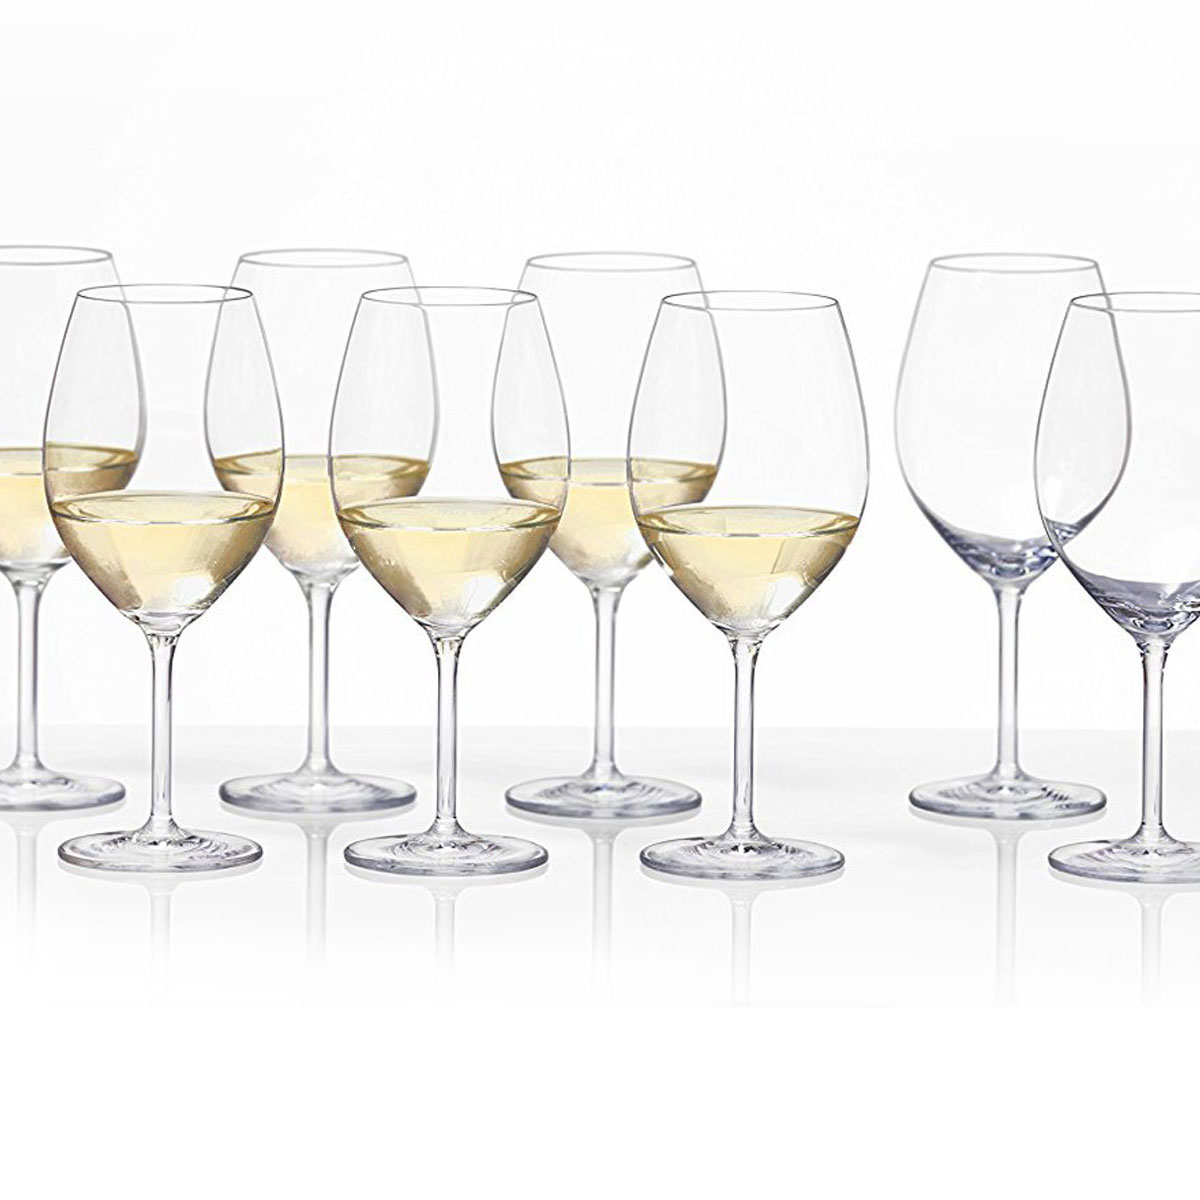 Schott Zwiesel Tritan Crystal, Forte Crystal White Wine Set 6 + 2 Free